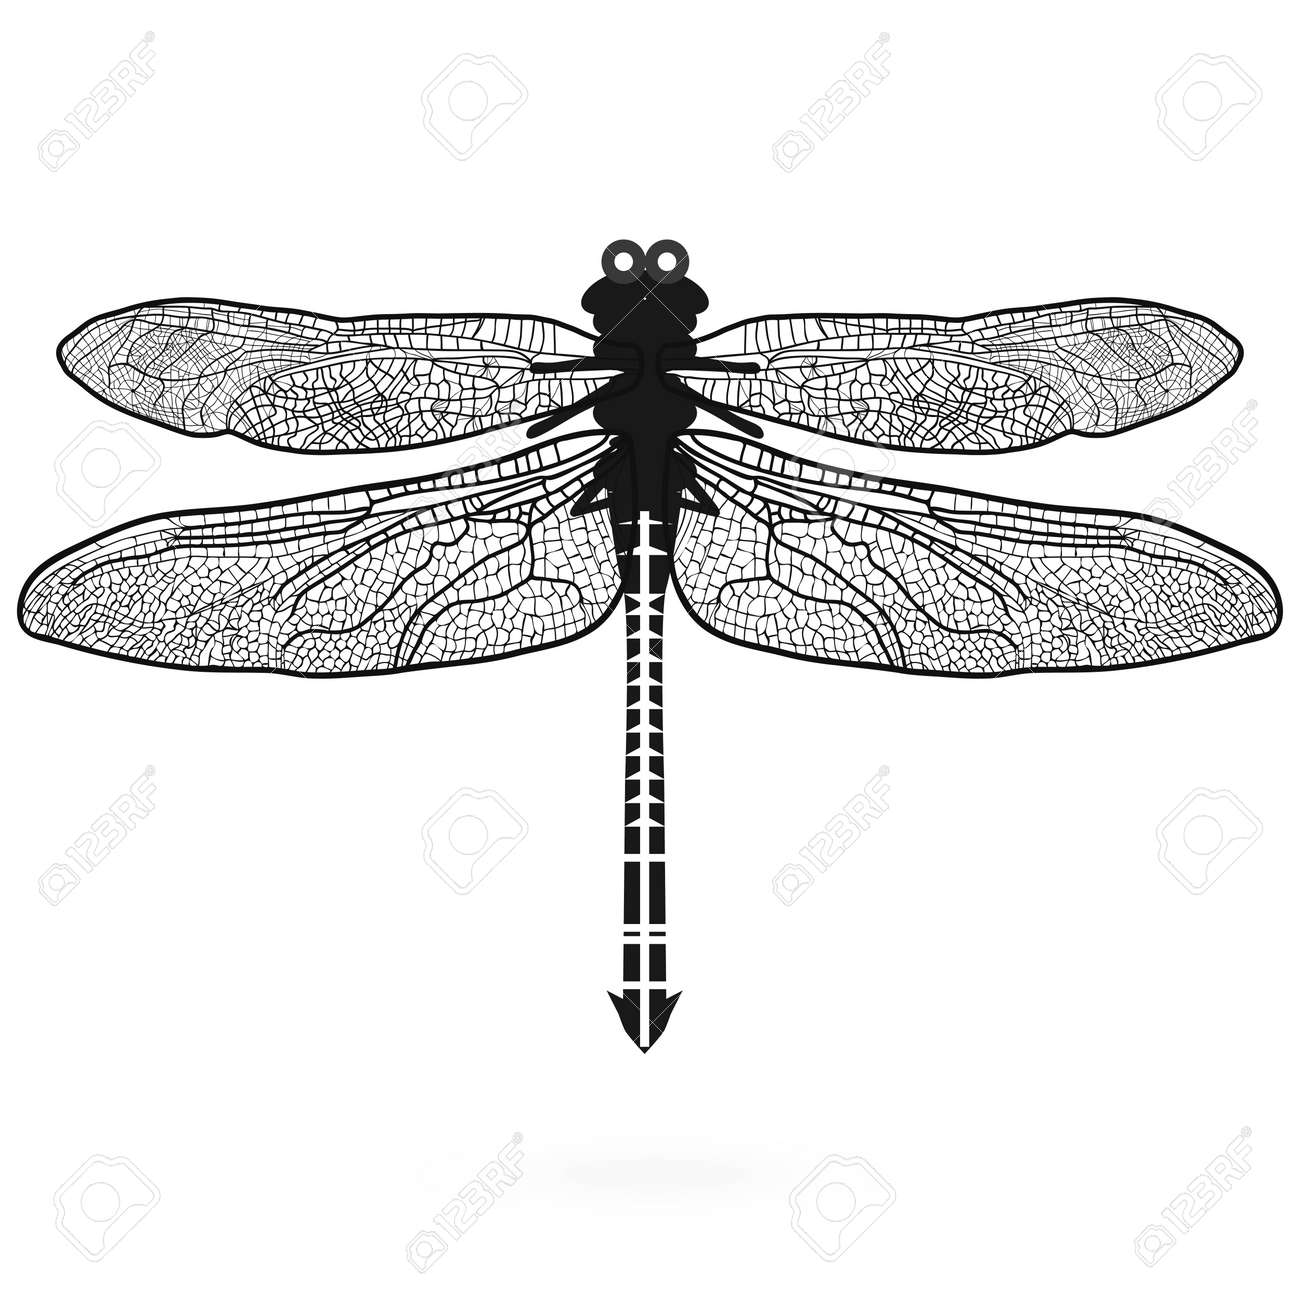 Dragonfly isolated high quality illustration sign icon design dragonfly isolated high quality illustration sign icon design sketch summer vintage logo symbol stock vector biocorpaavc